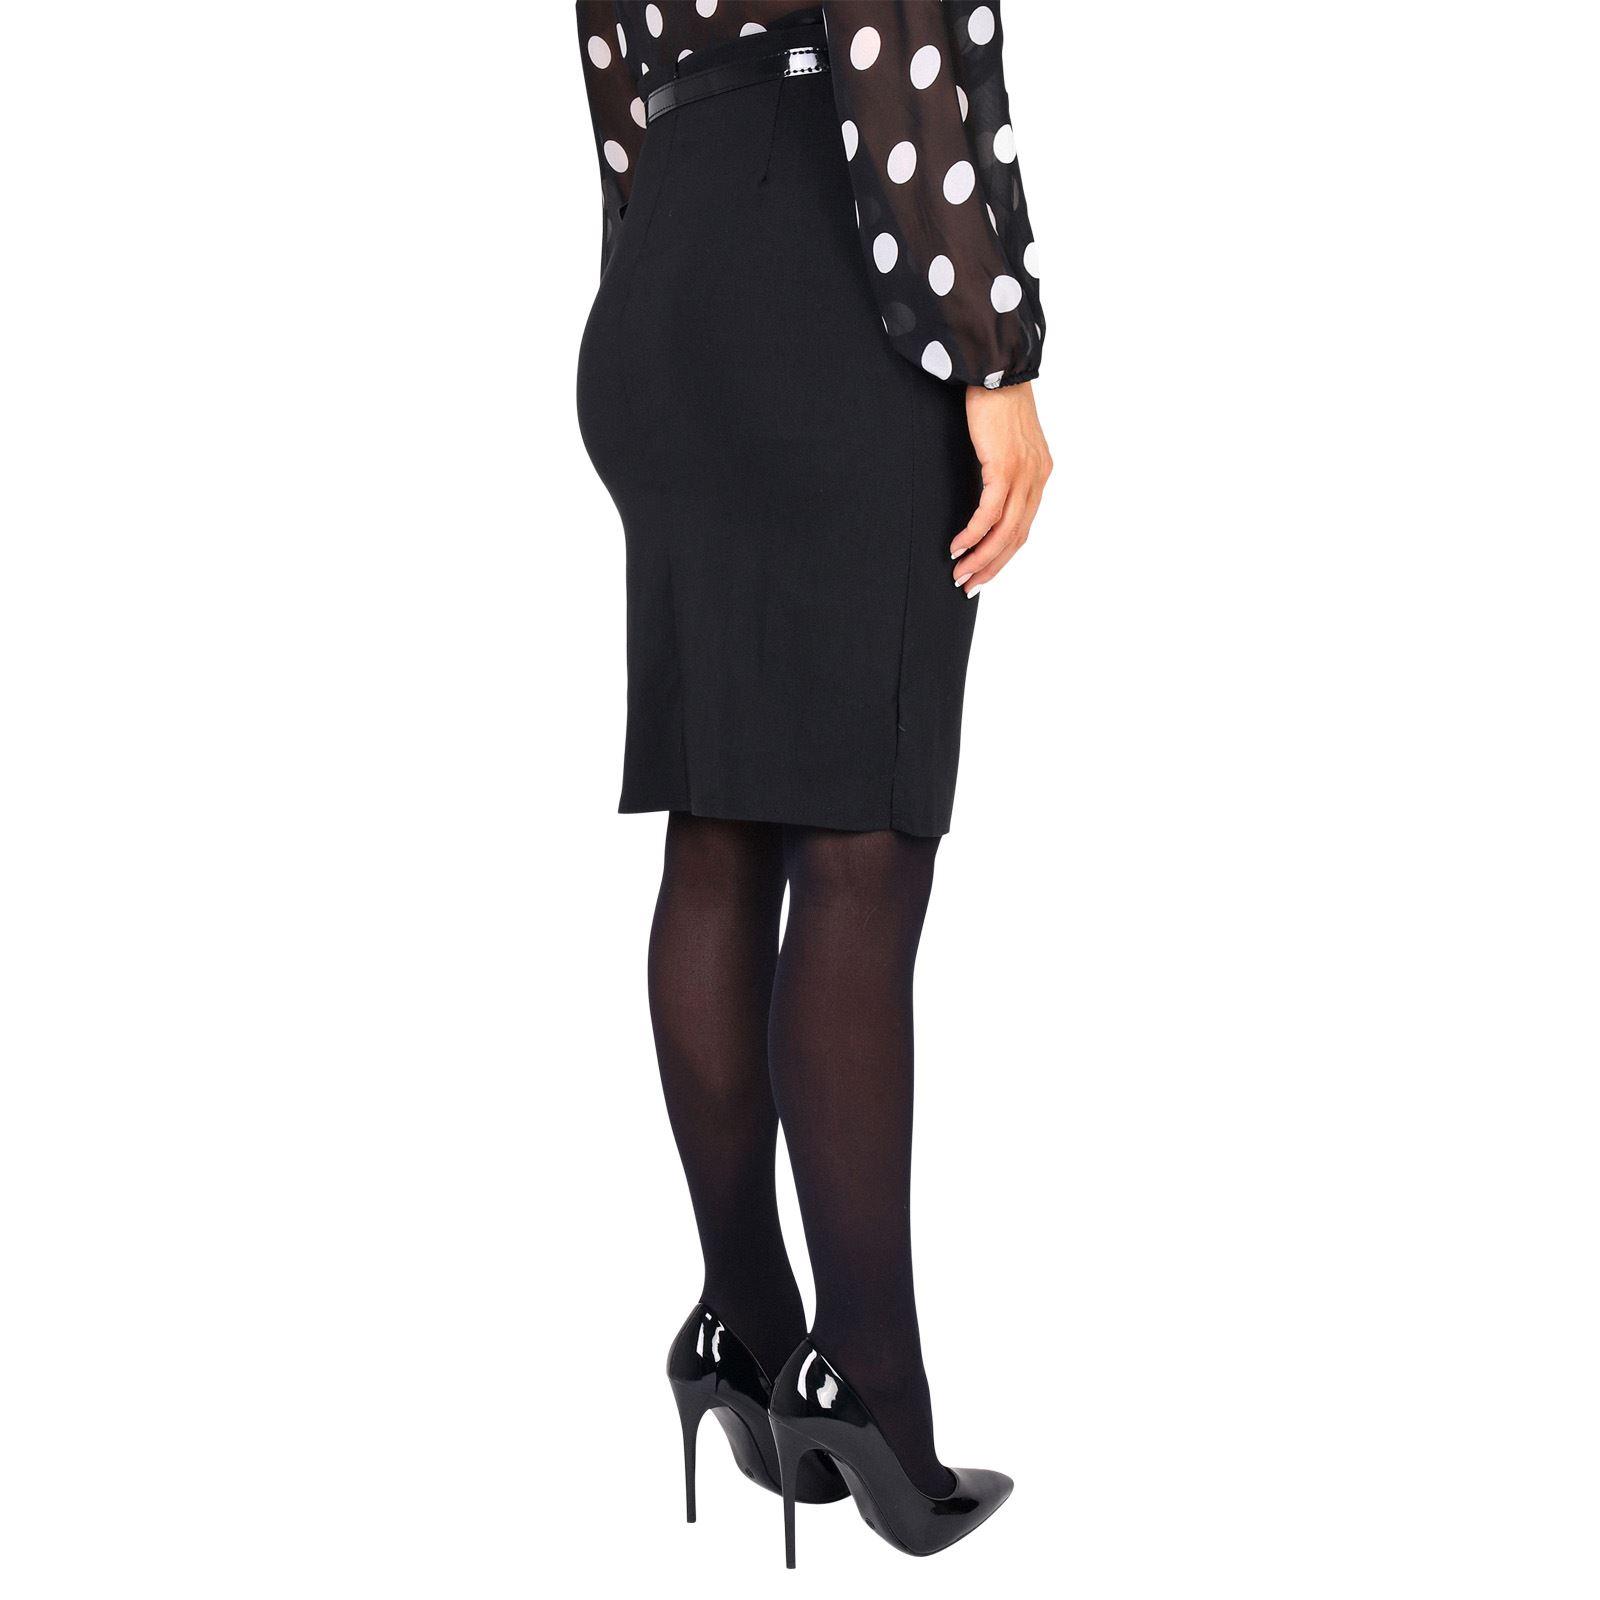 Falda Mujer Negra Ajustada Lápiz Tubo Oficina Uniforme Traje ... 0e316931a248